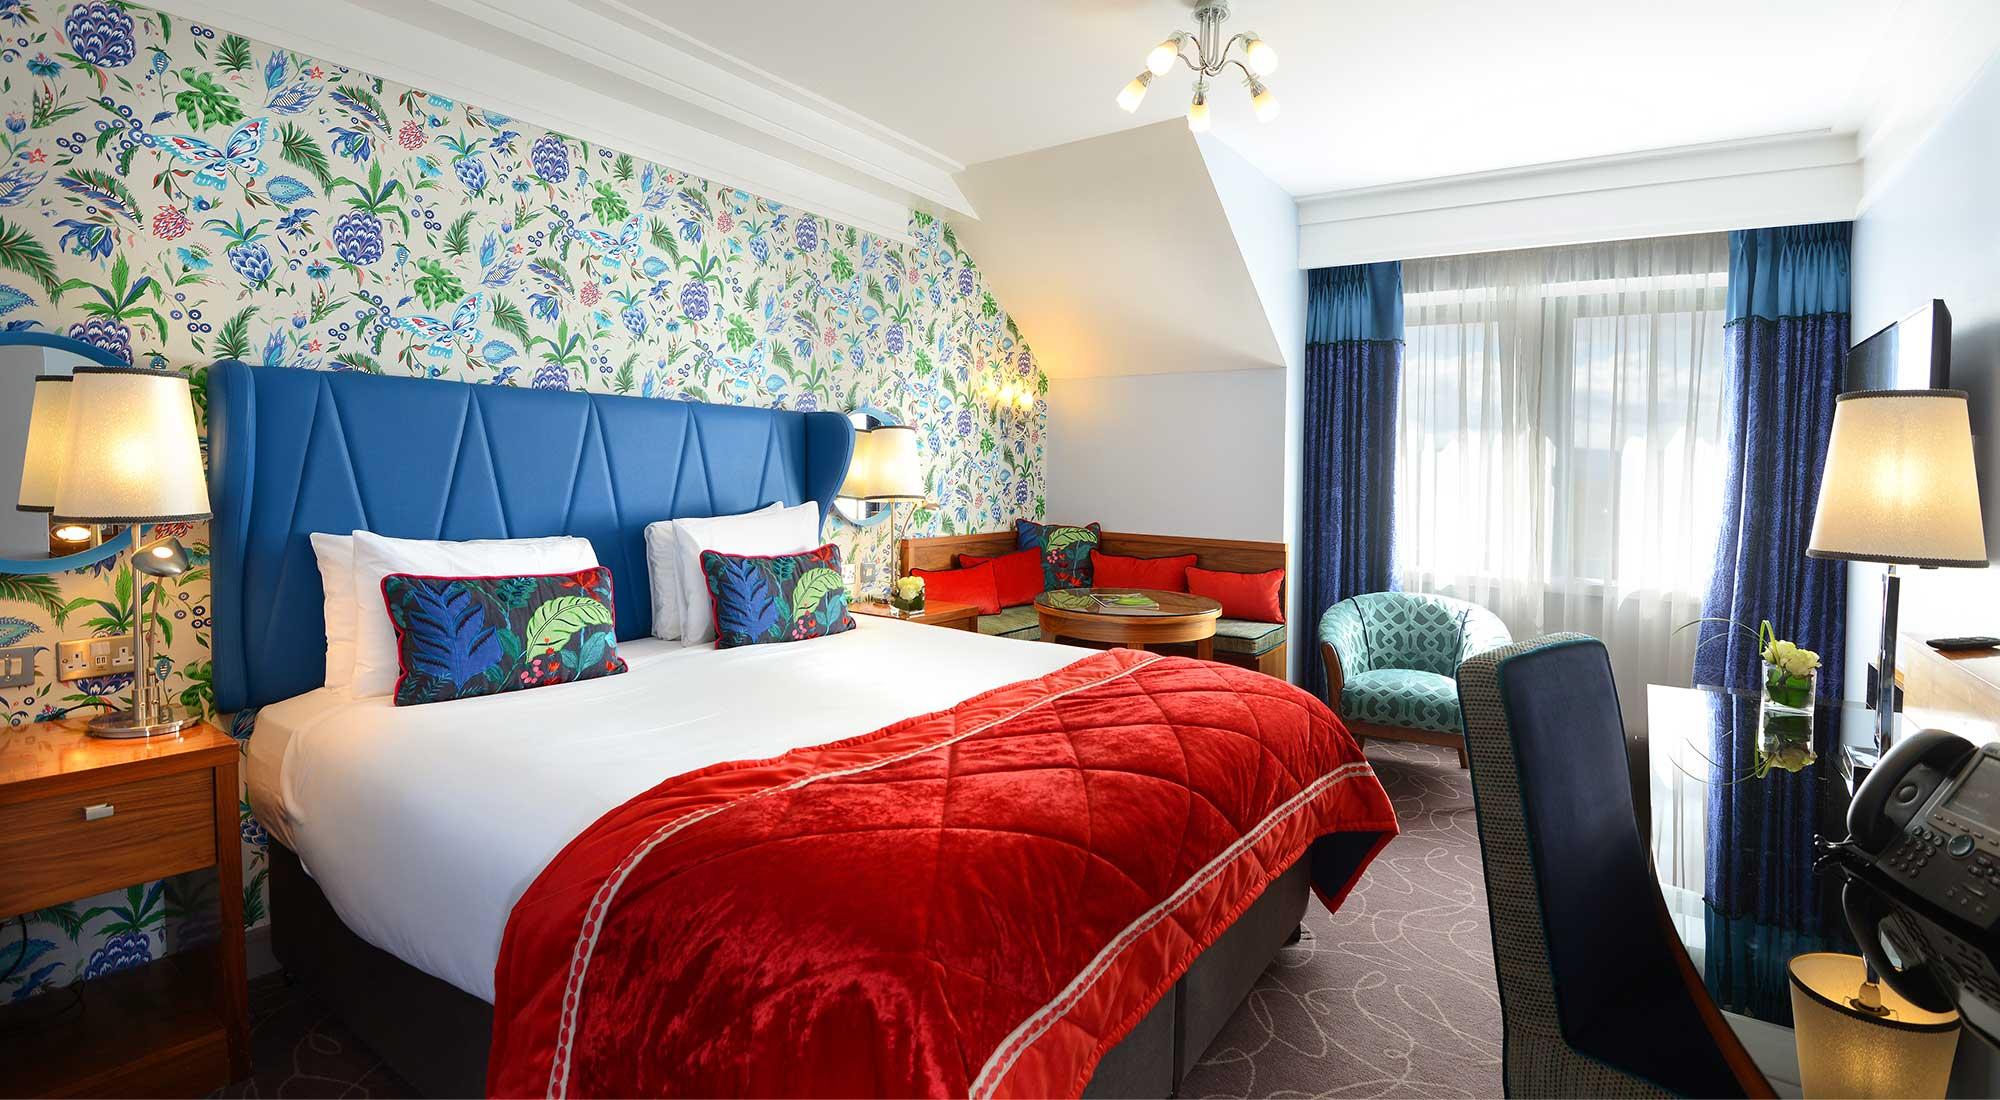 Deluxe Hotel Rooms Accommodation Dublin Dublin Castle